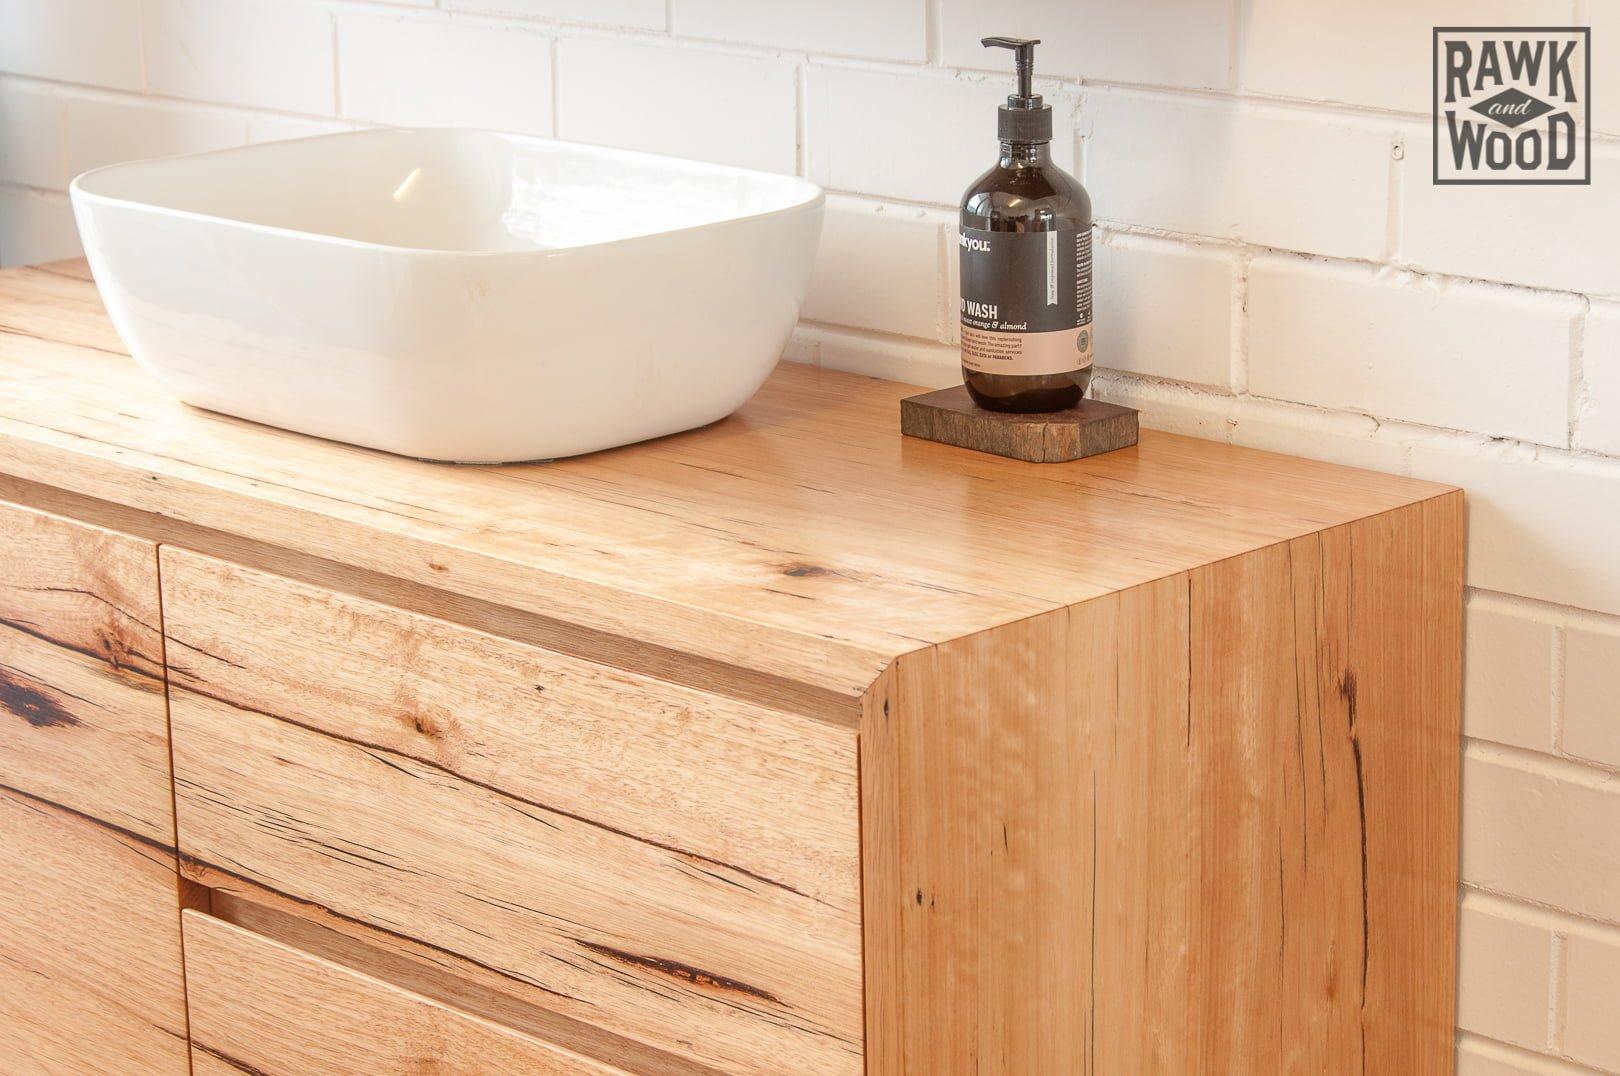 Timber Bathroom Vanity Rawk And Wood